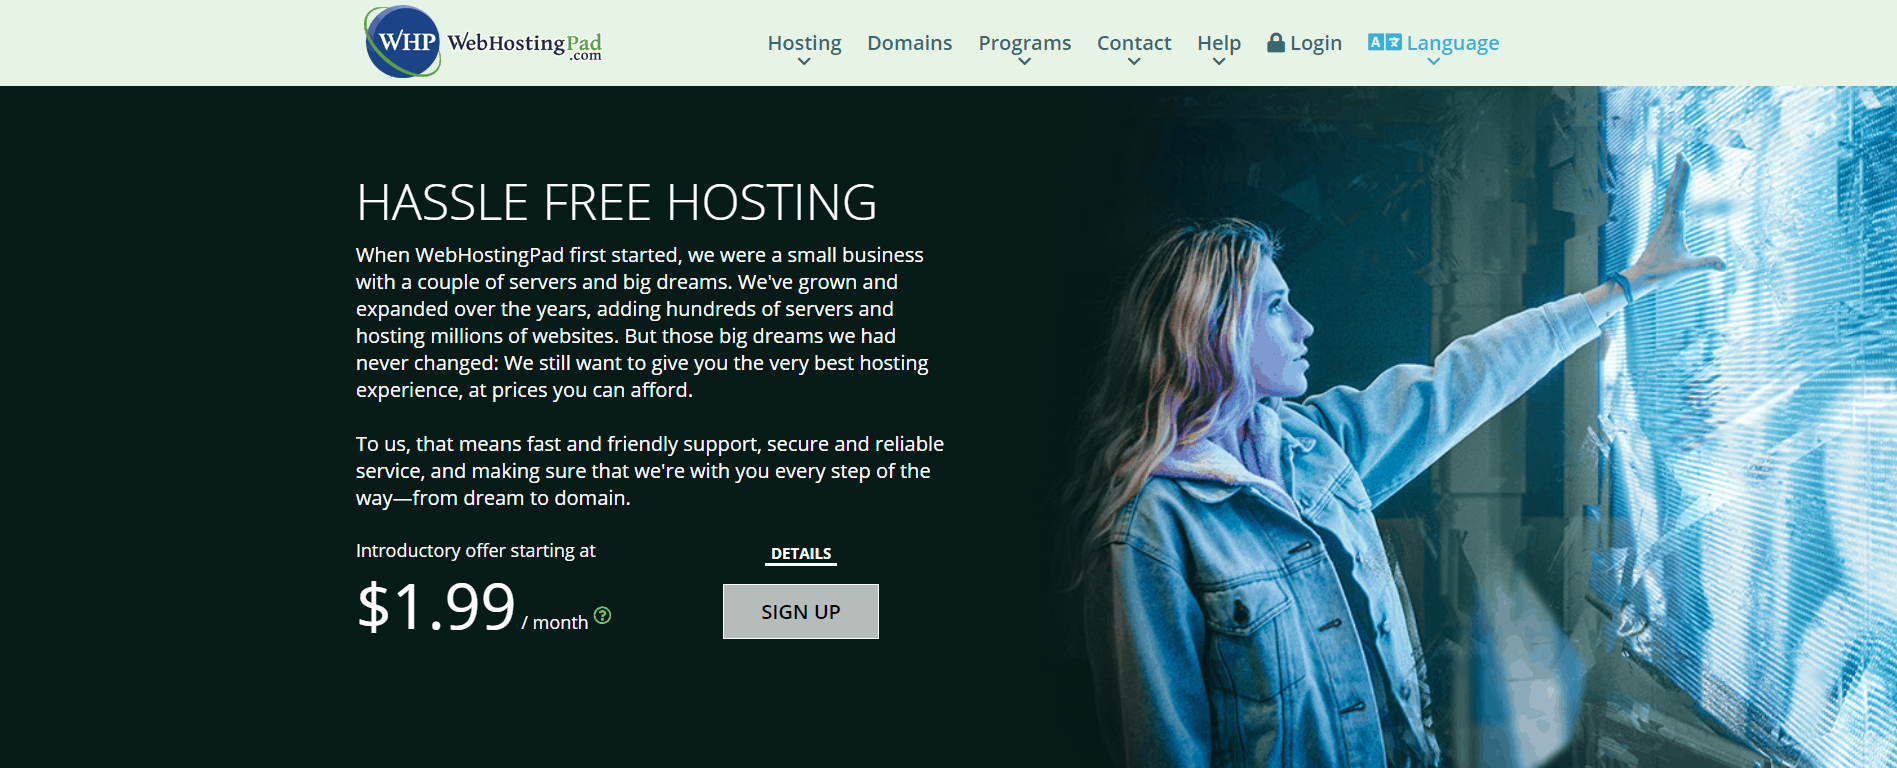 webhostingpad-mine